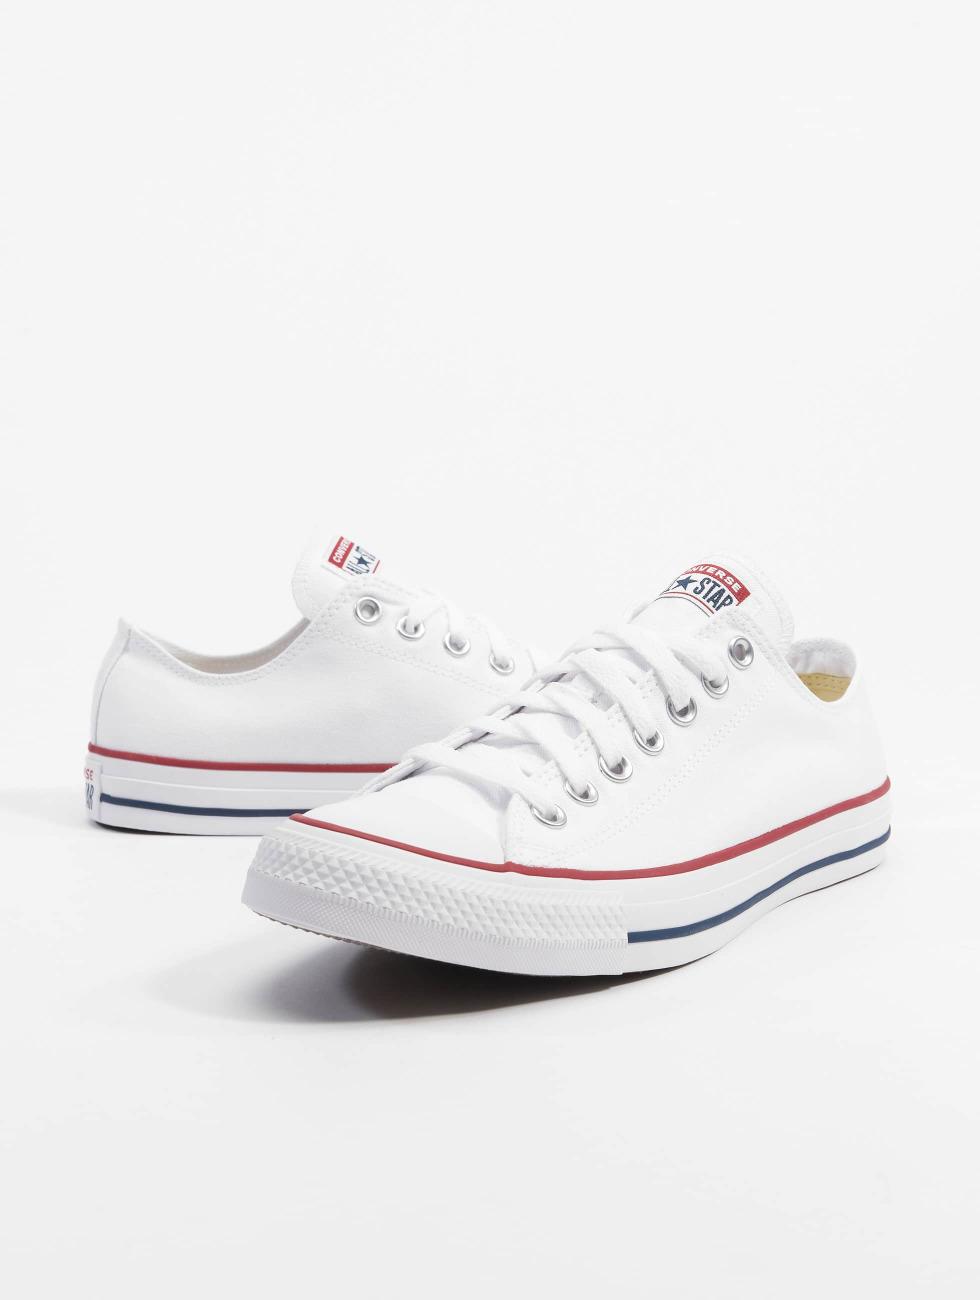 Converse Sneakers All Star Dainty Ox Chucks white